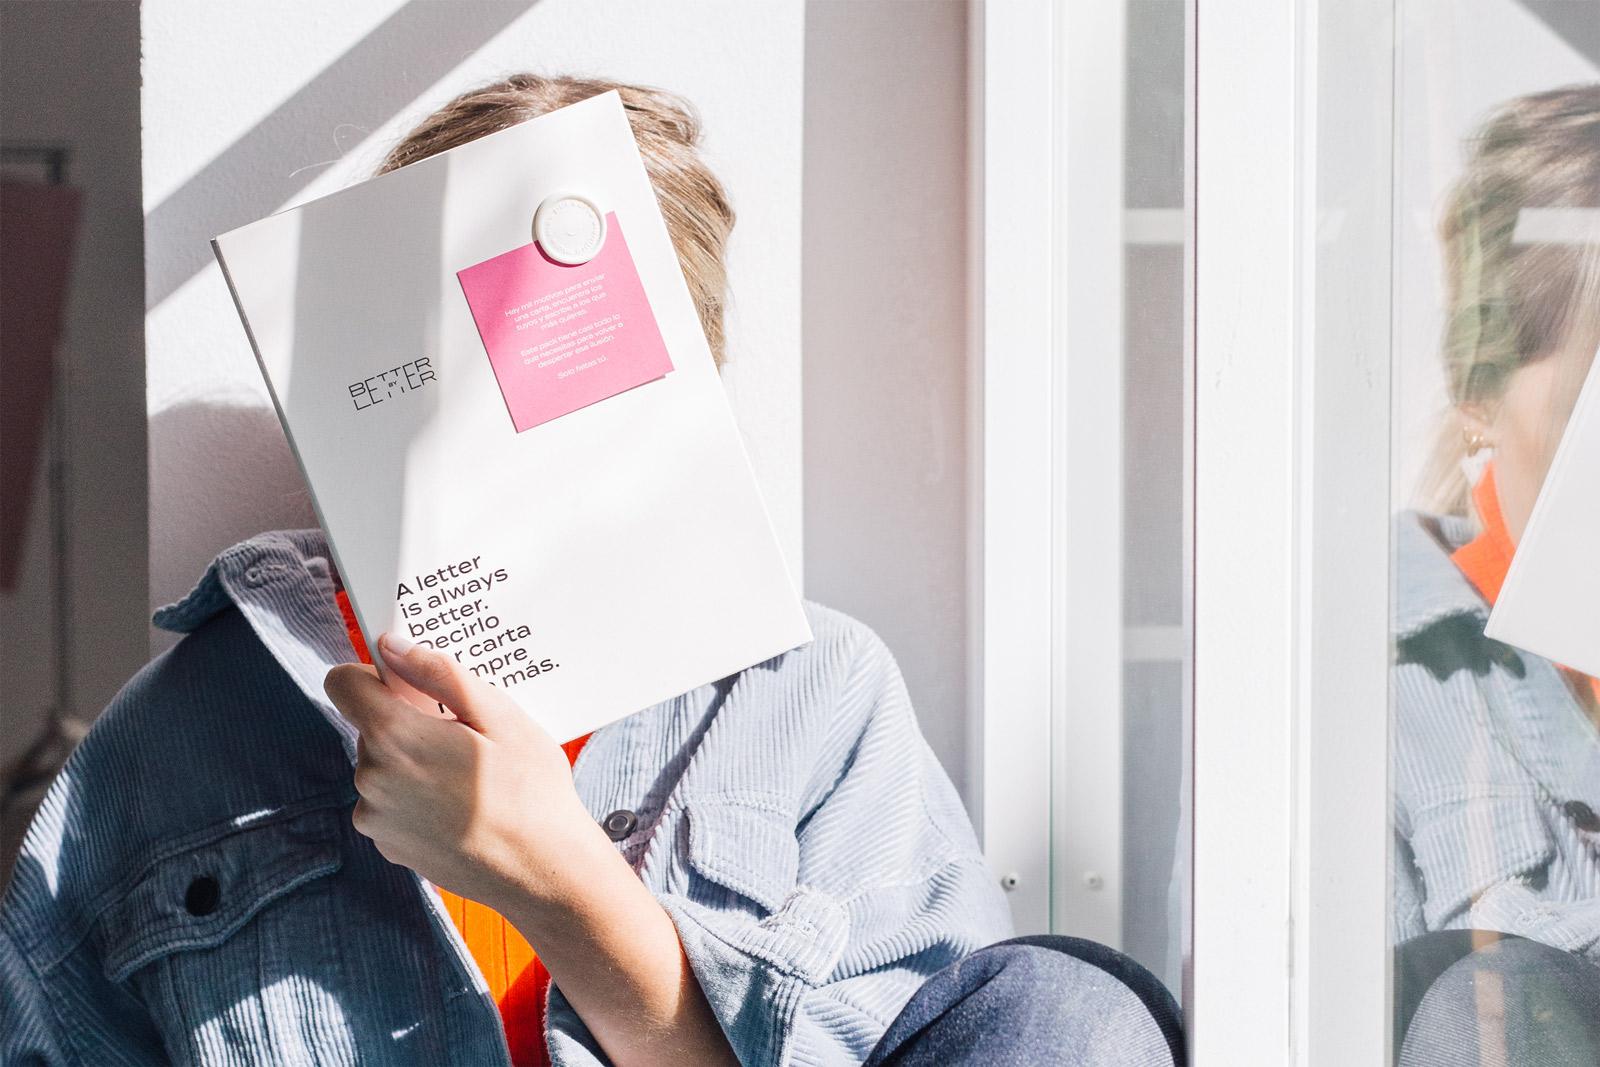 Descubre el Manifiesto - Better by Letter